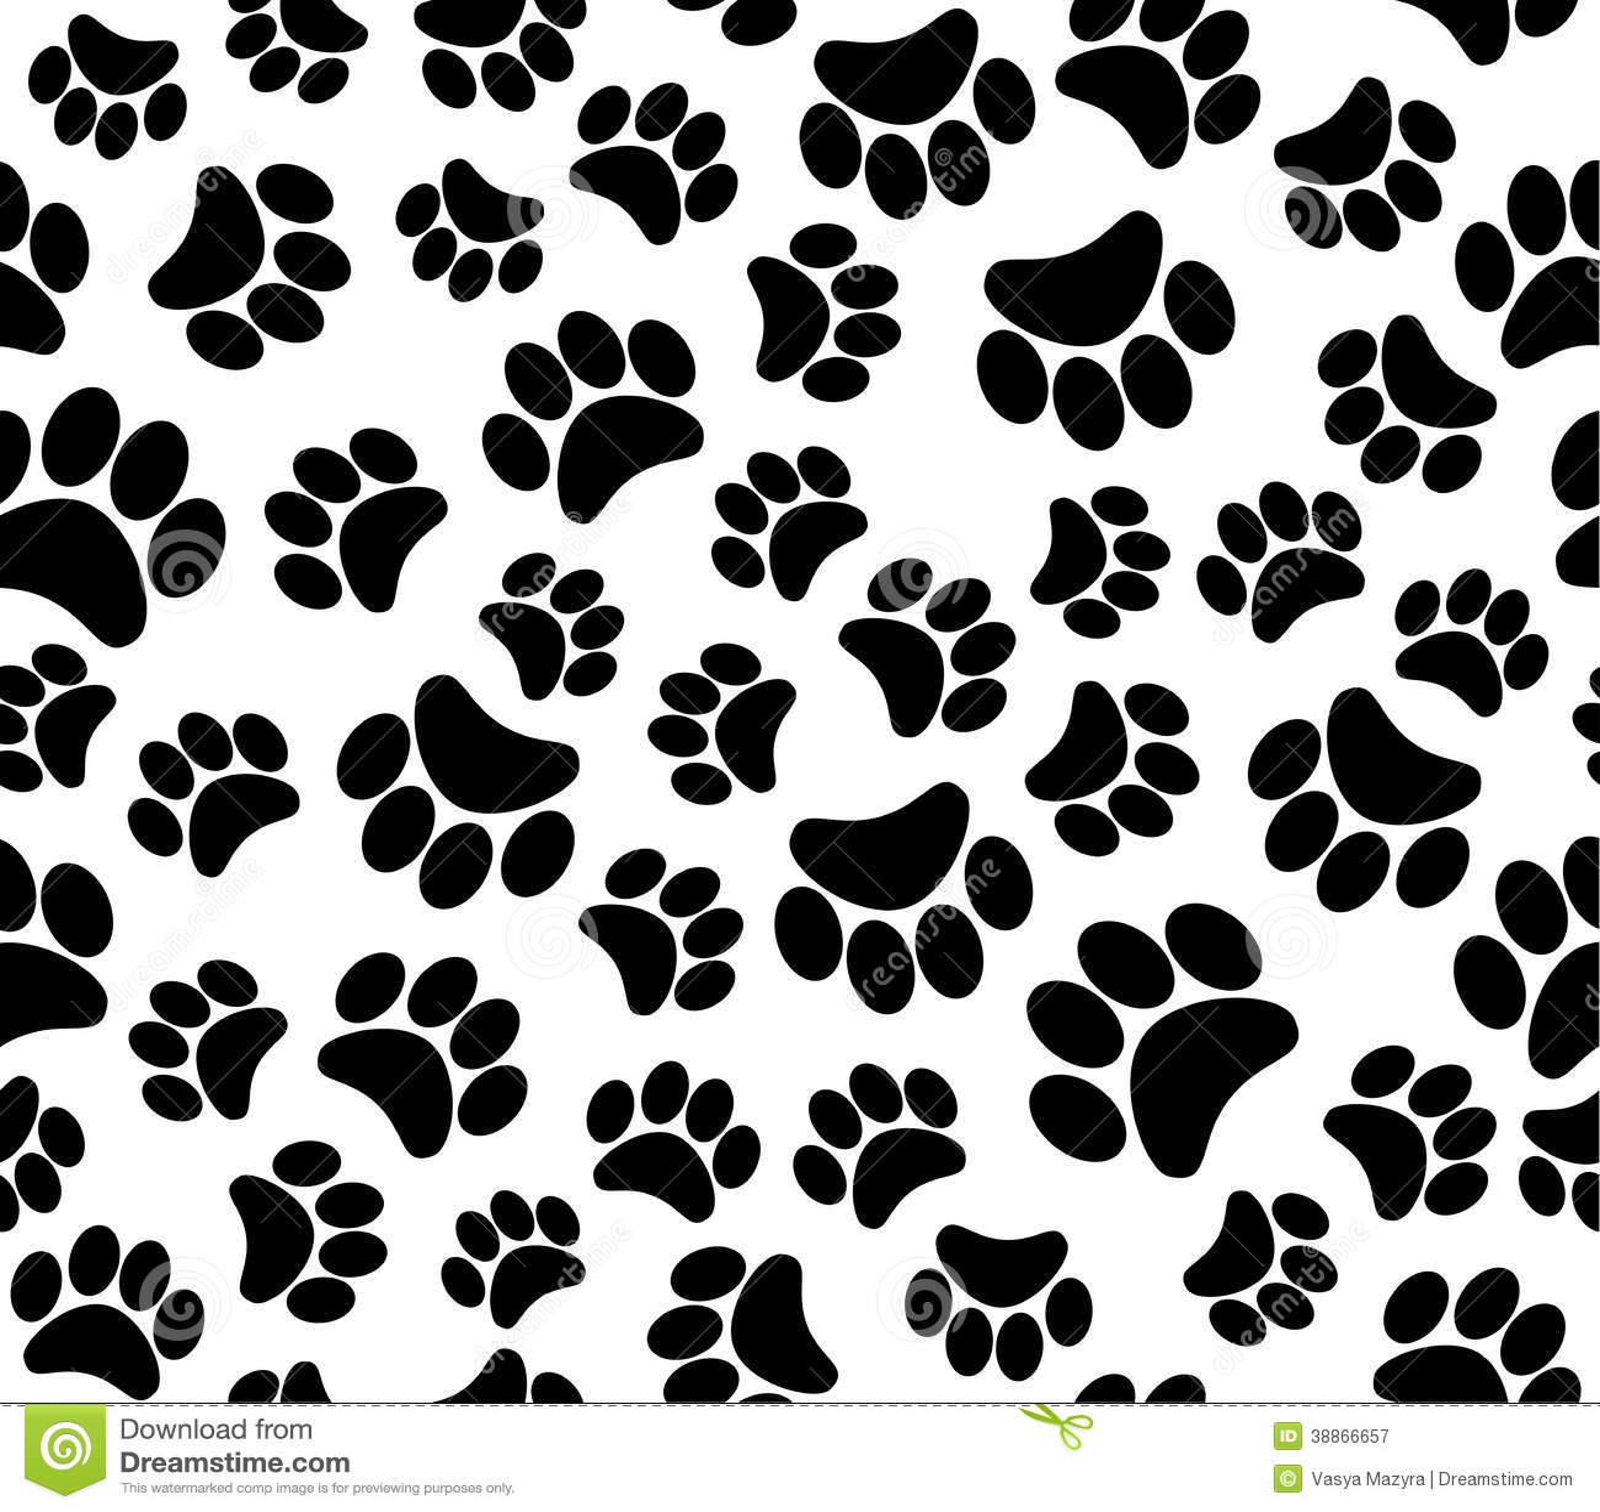 Animal foot prints patterns - photo#6